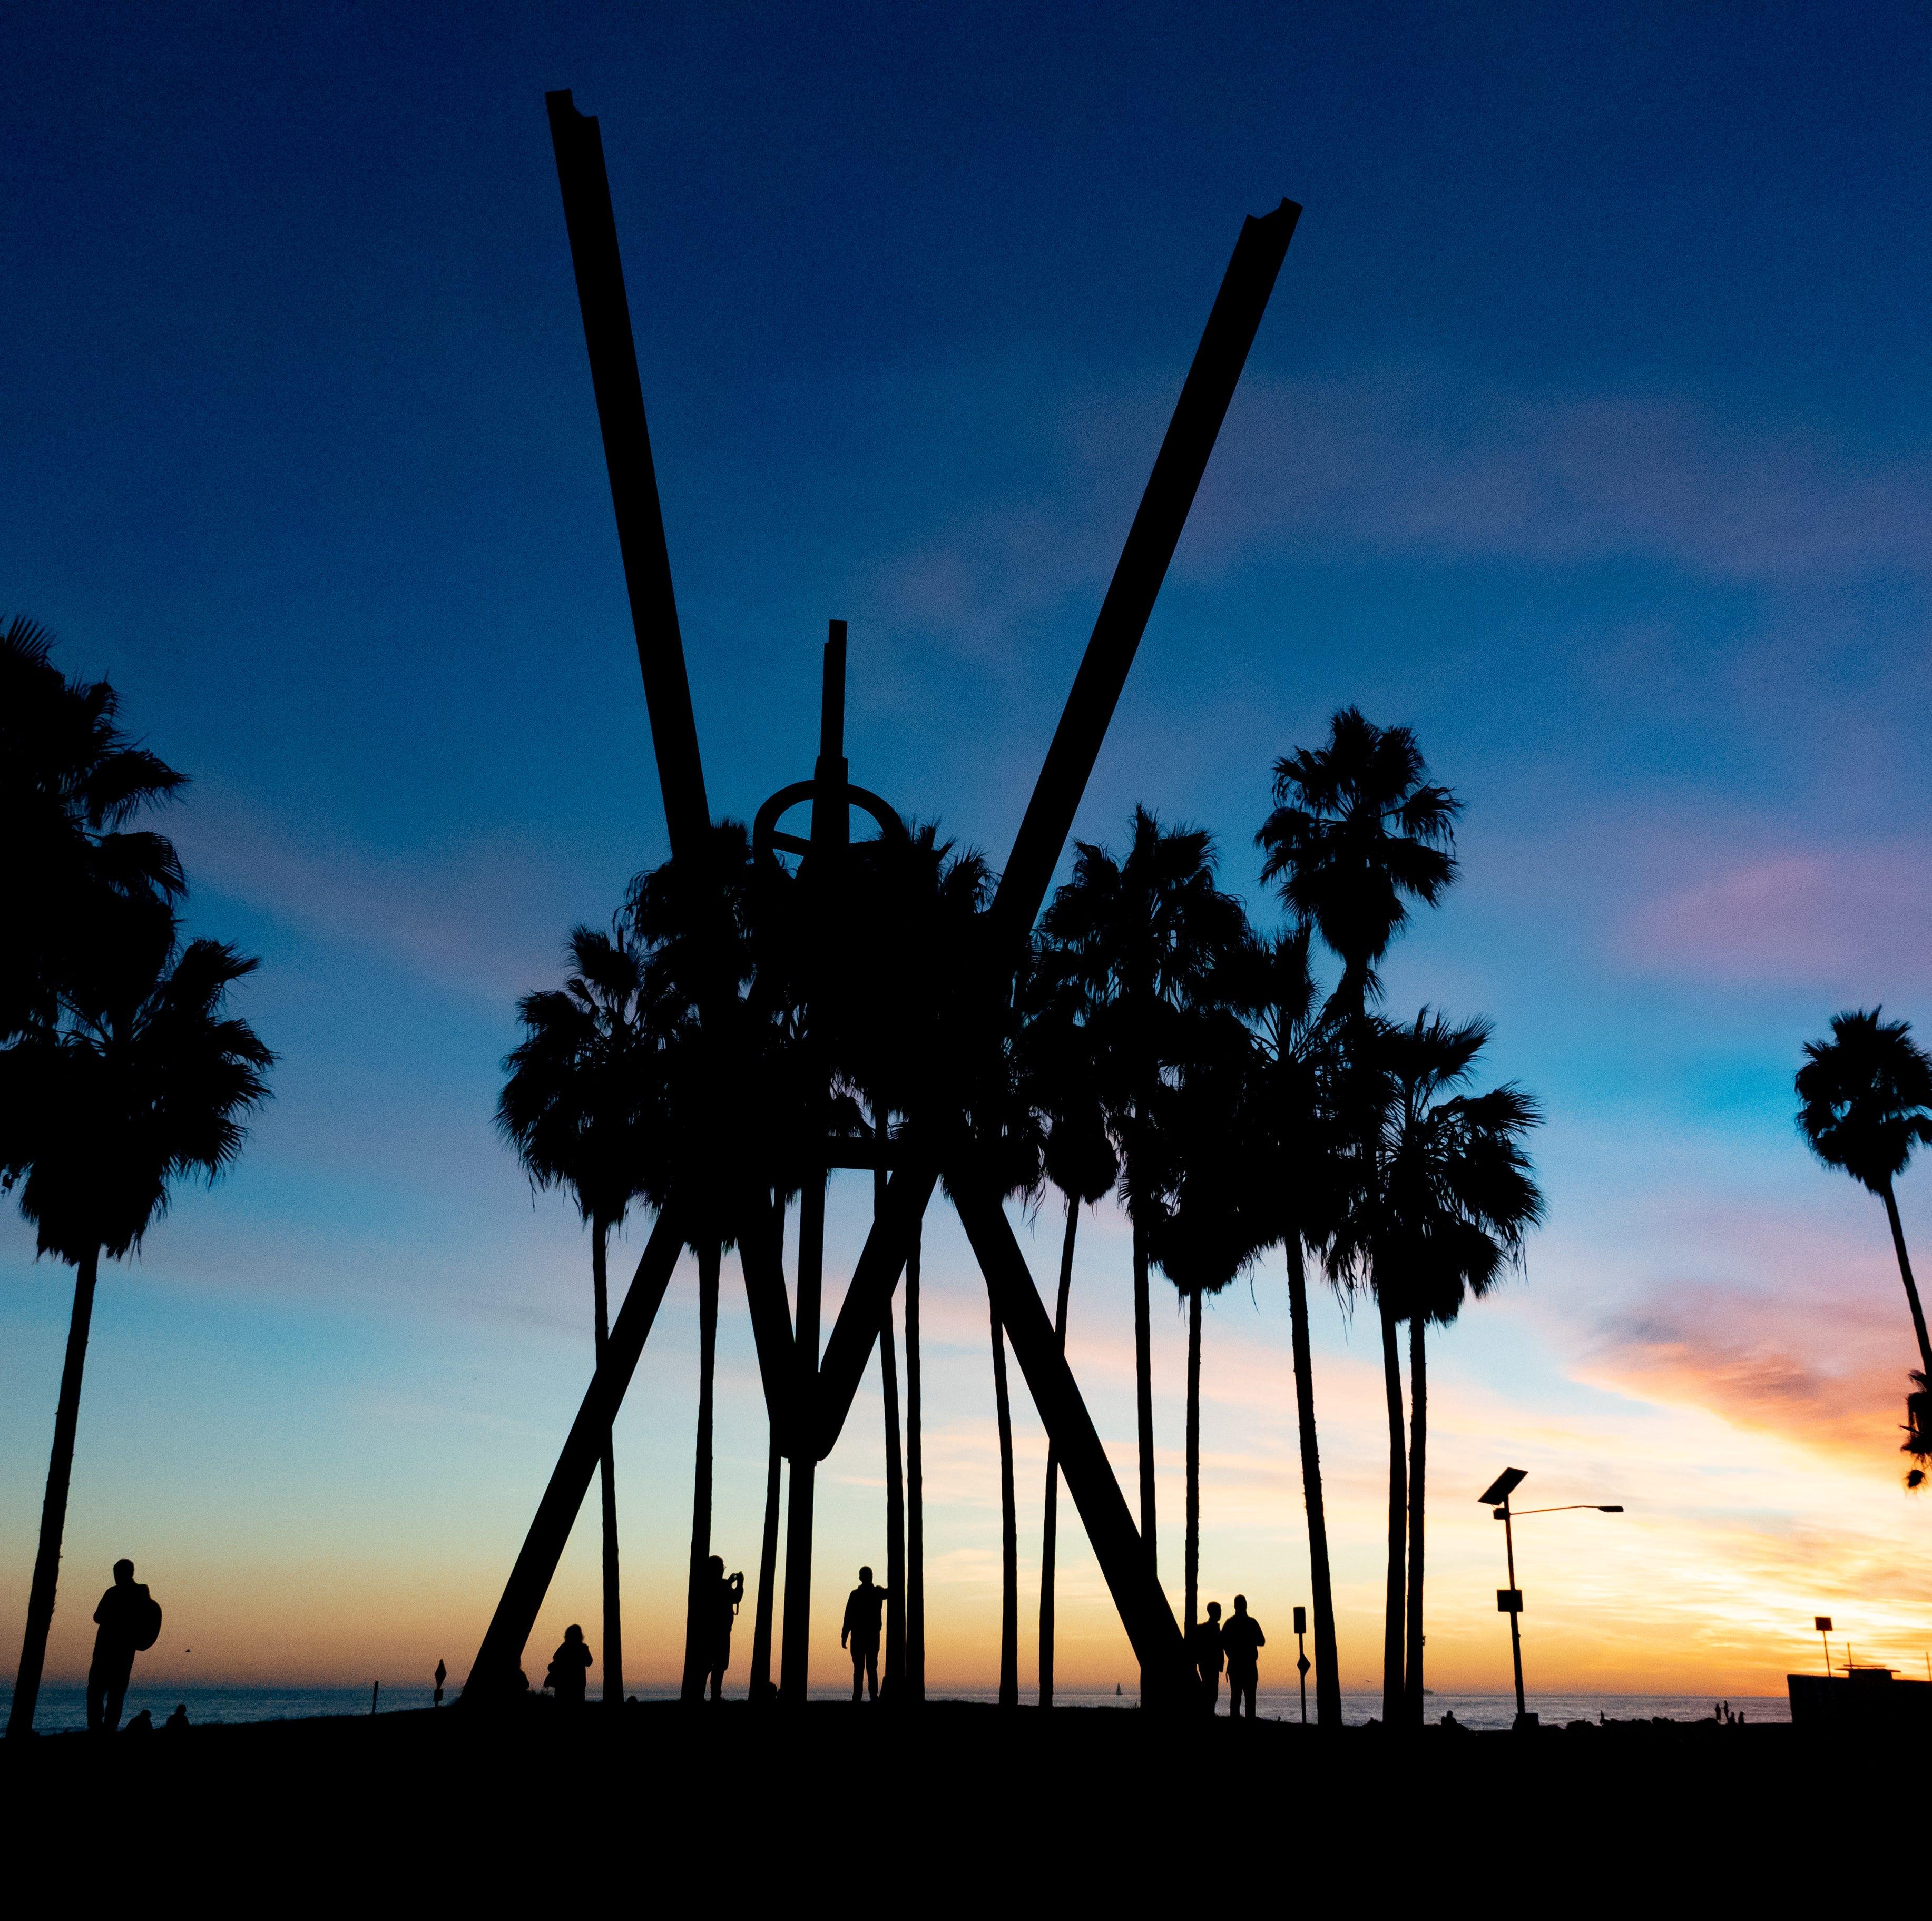 The V for Venice sculpture in Venice Beach.